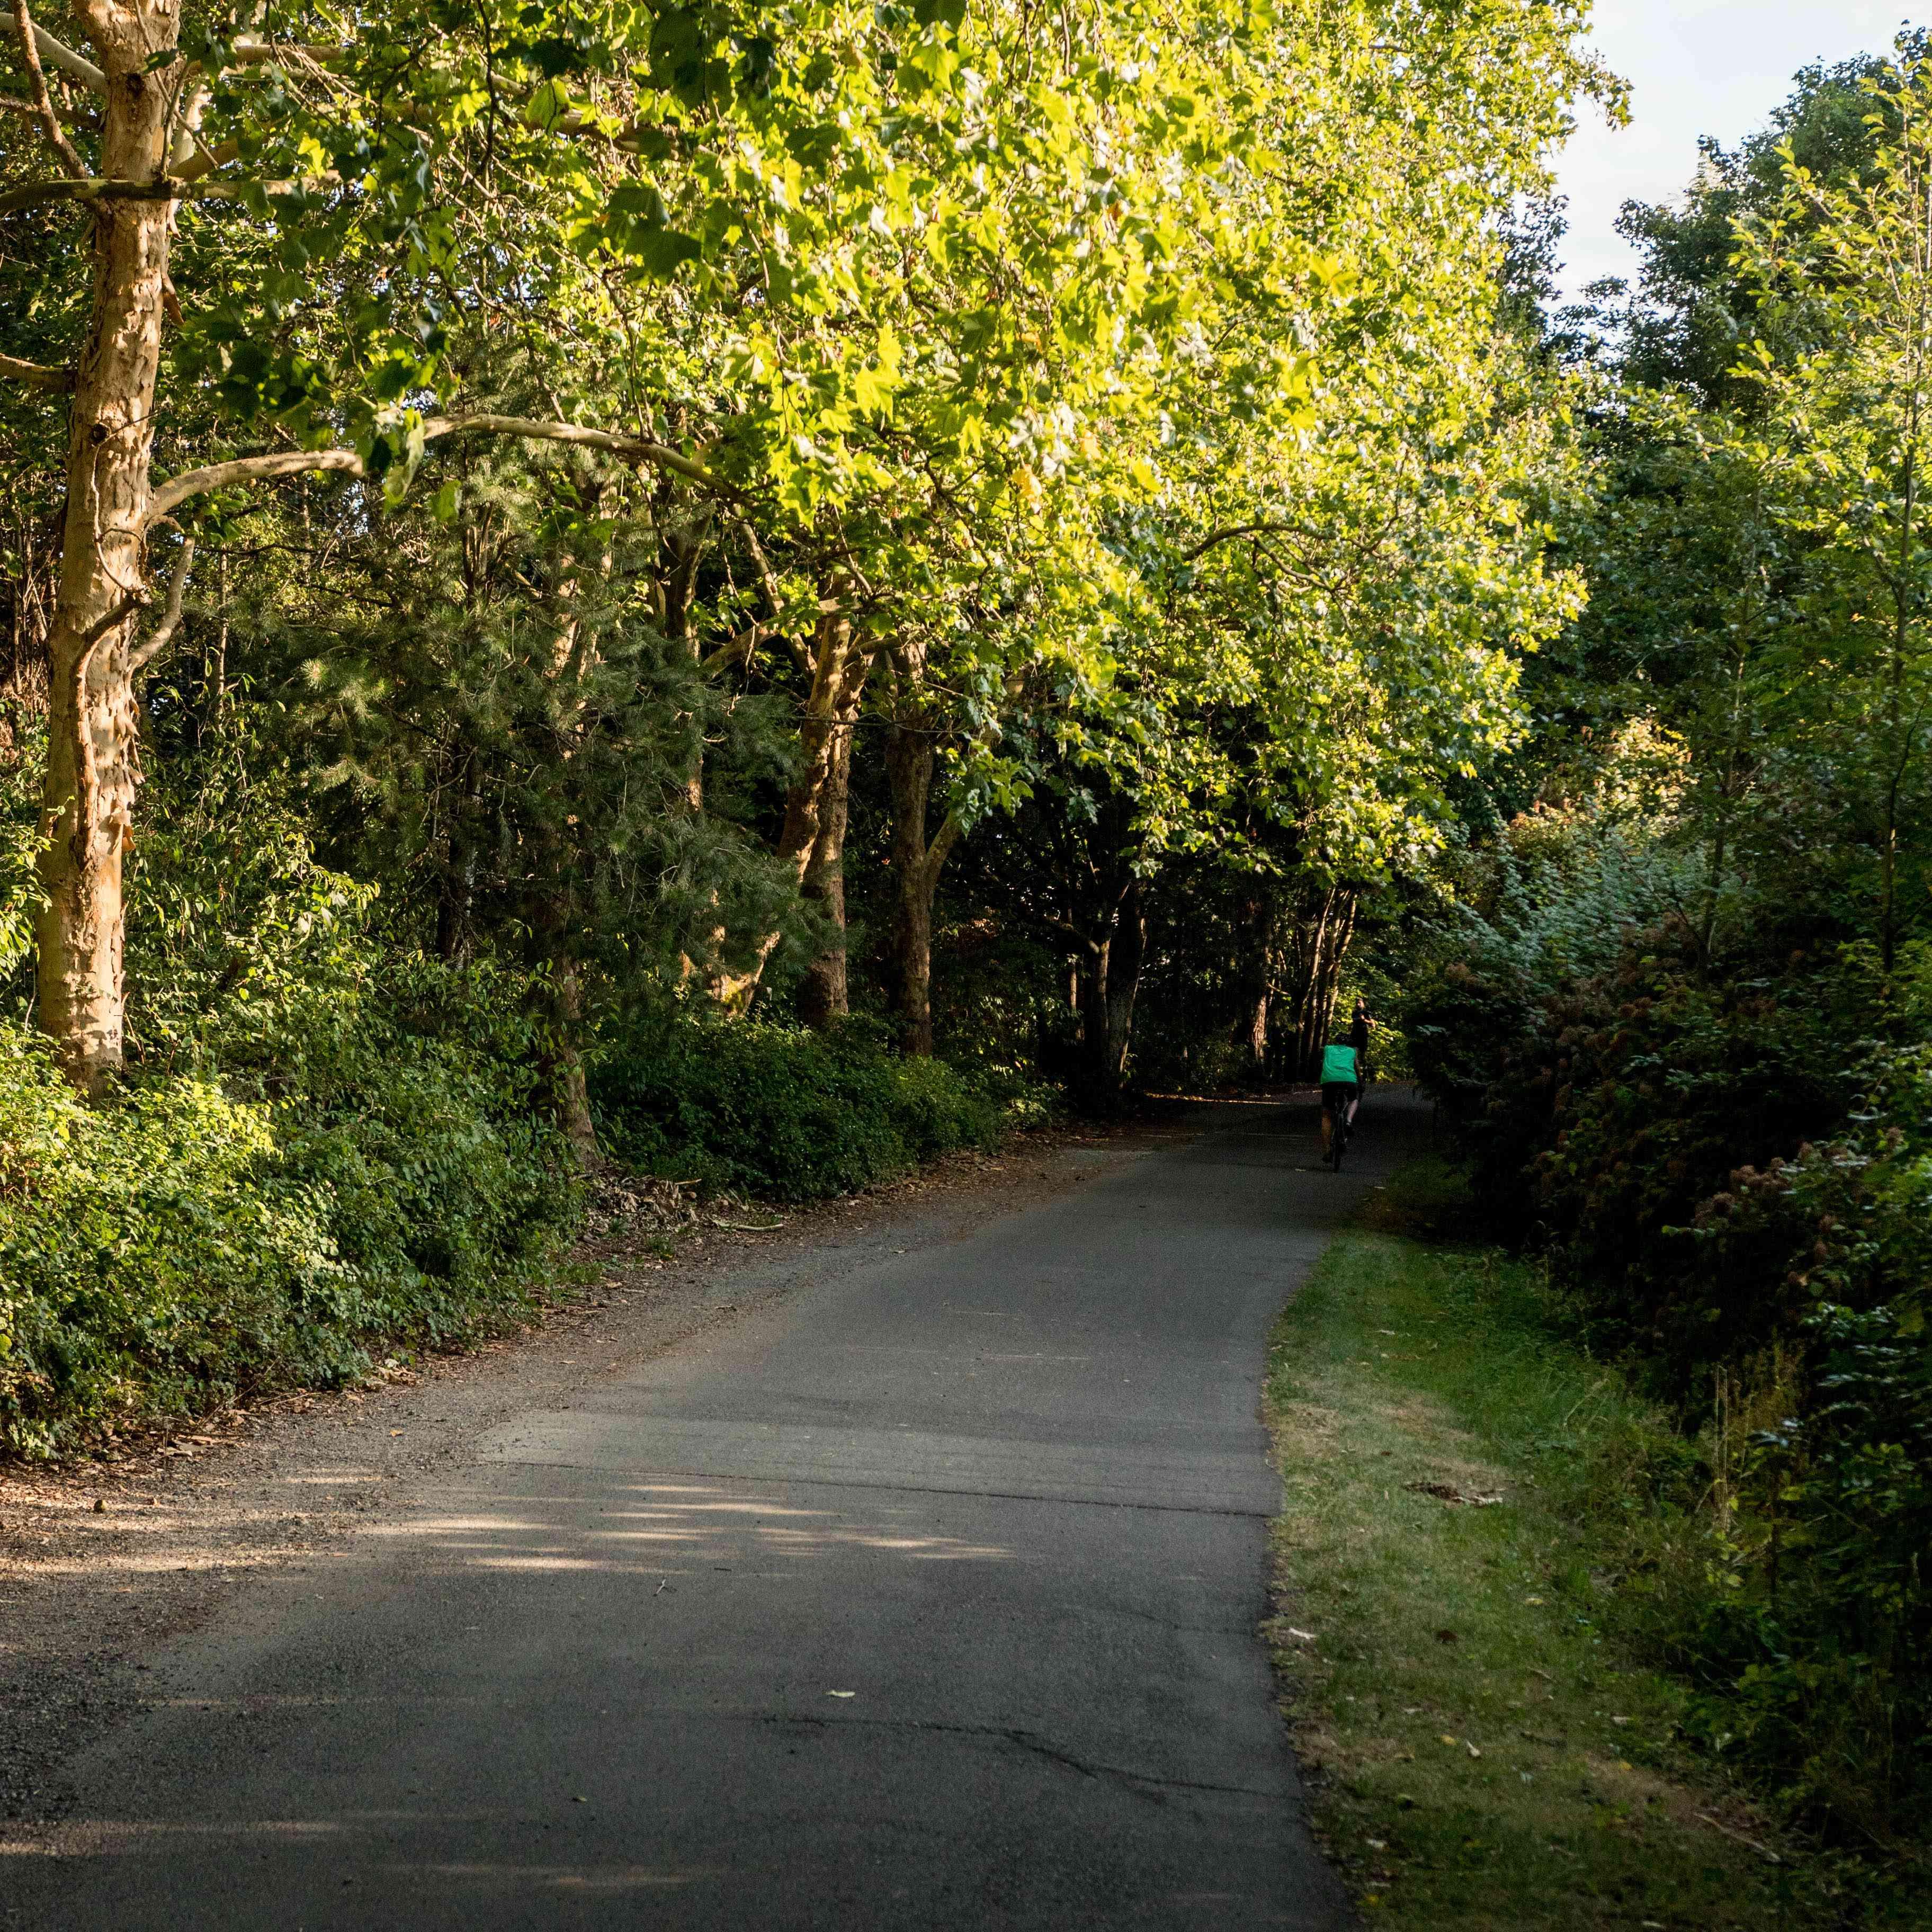 Burke-Gilman Trail in Seattle, Washington